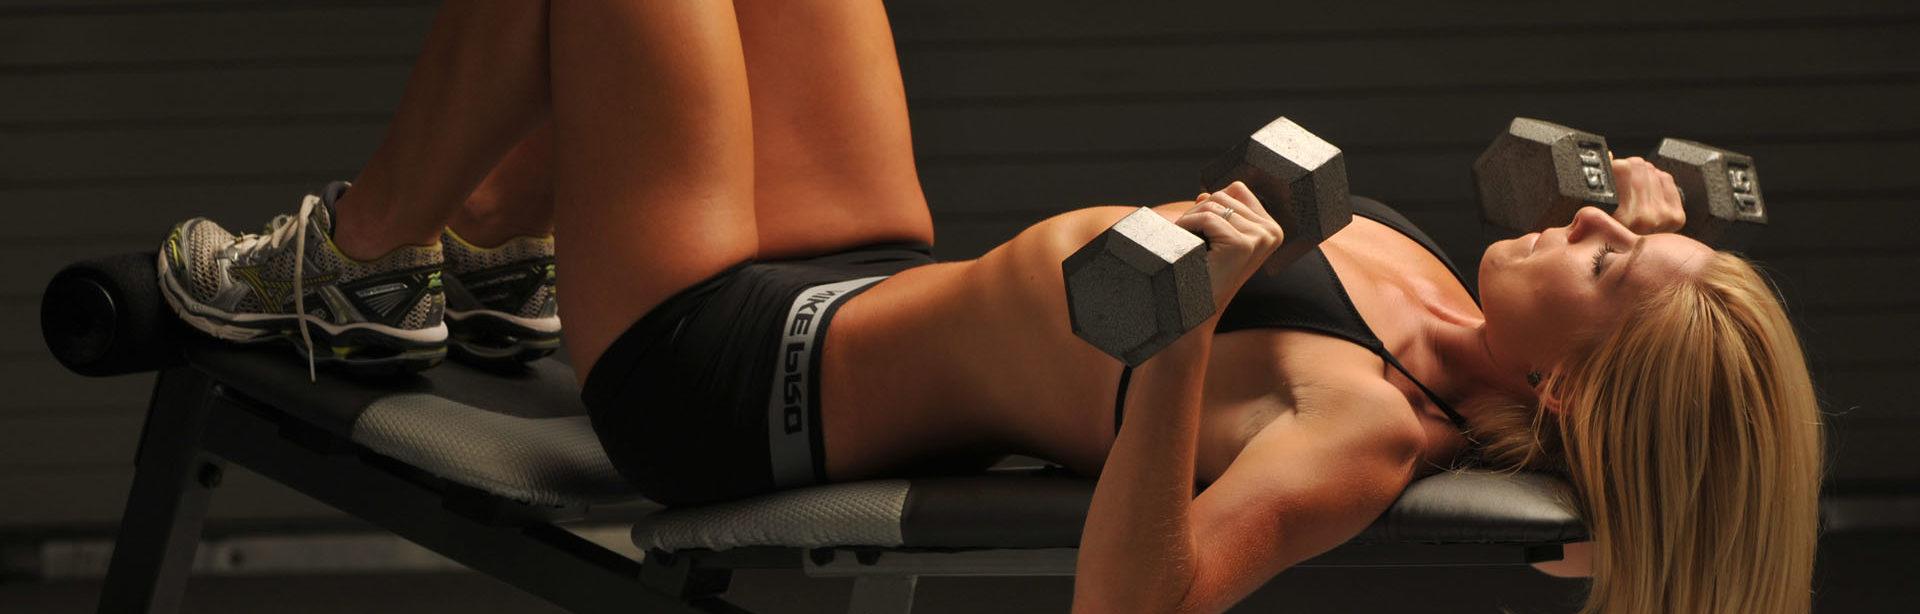 lauren-fitness-photography-0191-e1529356603786